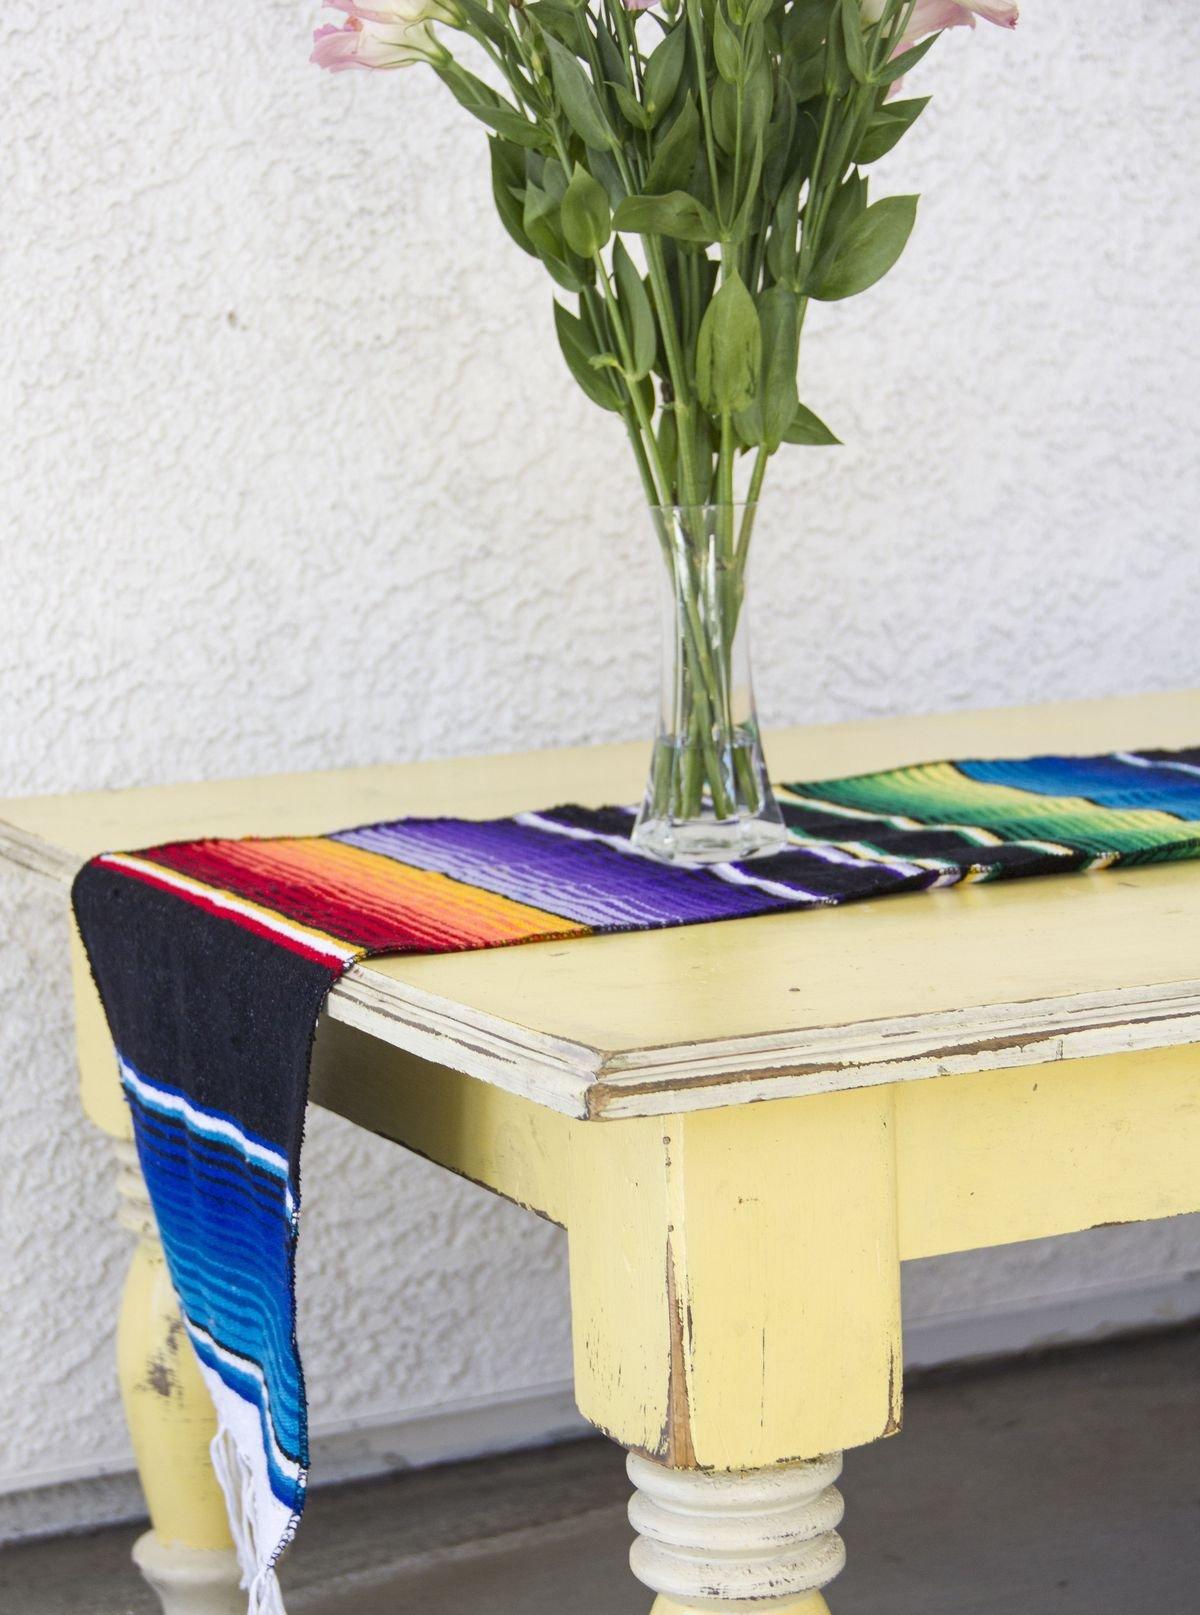 Del Mex (TM) Mexican Serape Blanket Table Runner (Black)